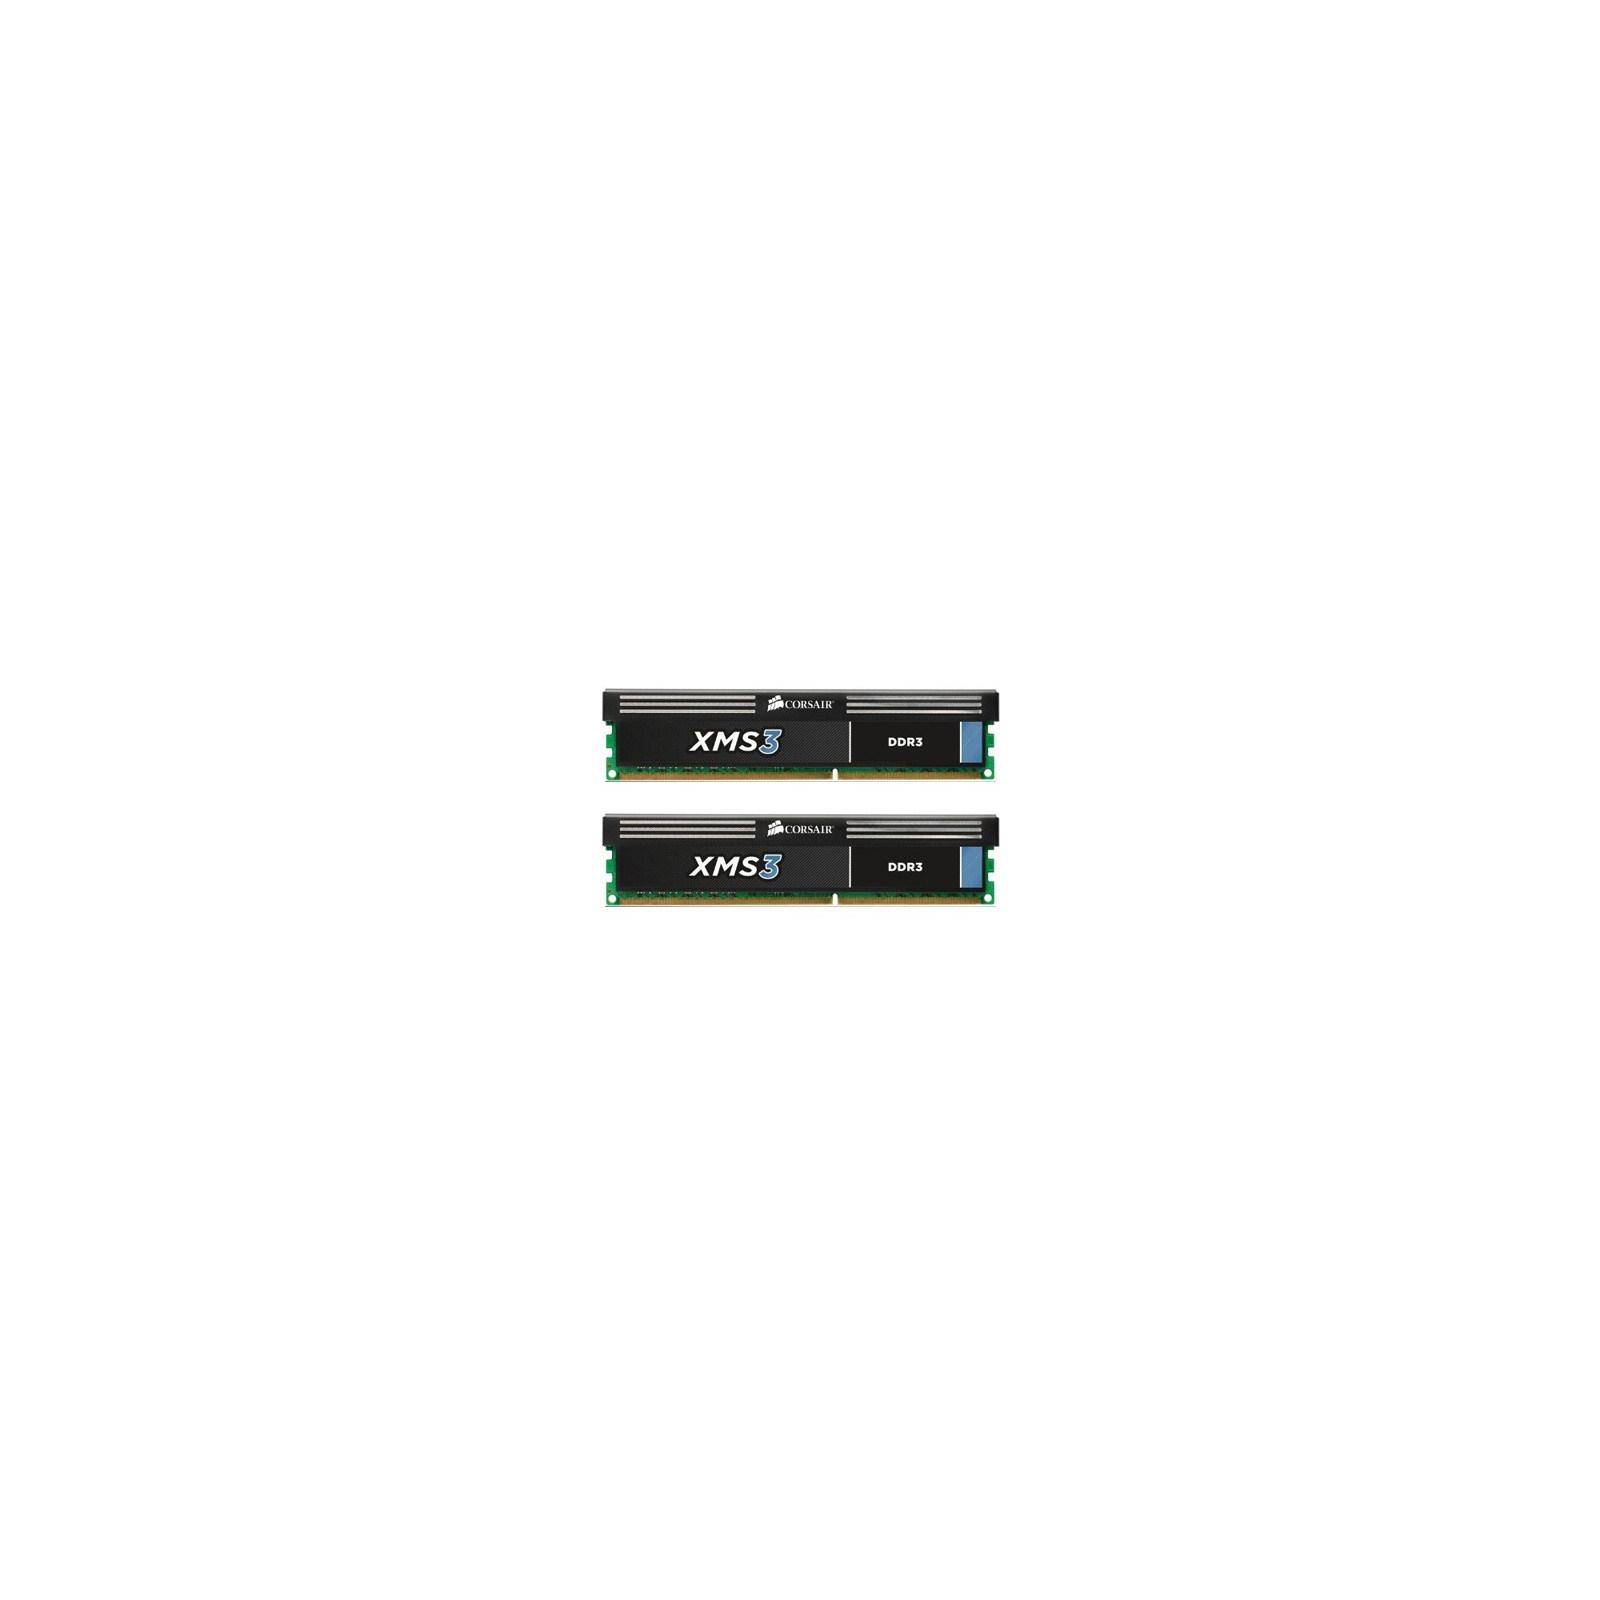 Модуль памяти для компьютера DDR3 4GB (2x2GB) 2000 MHz CORSAIR (CMX4GX3M2B2000C9)